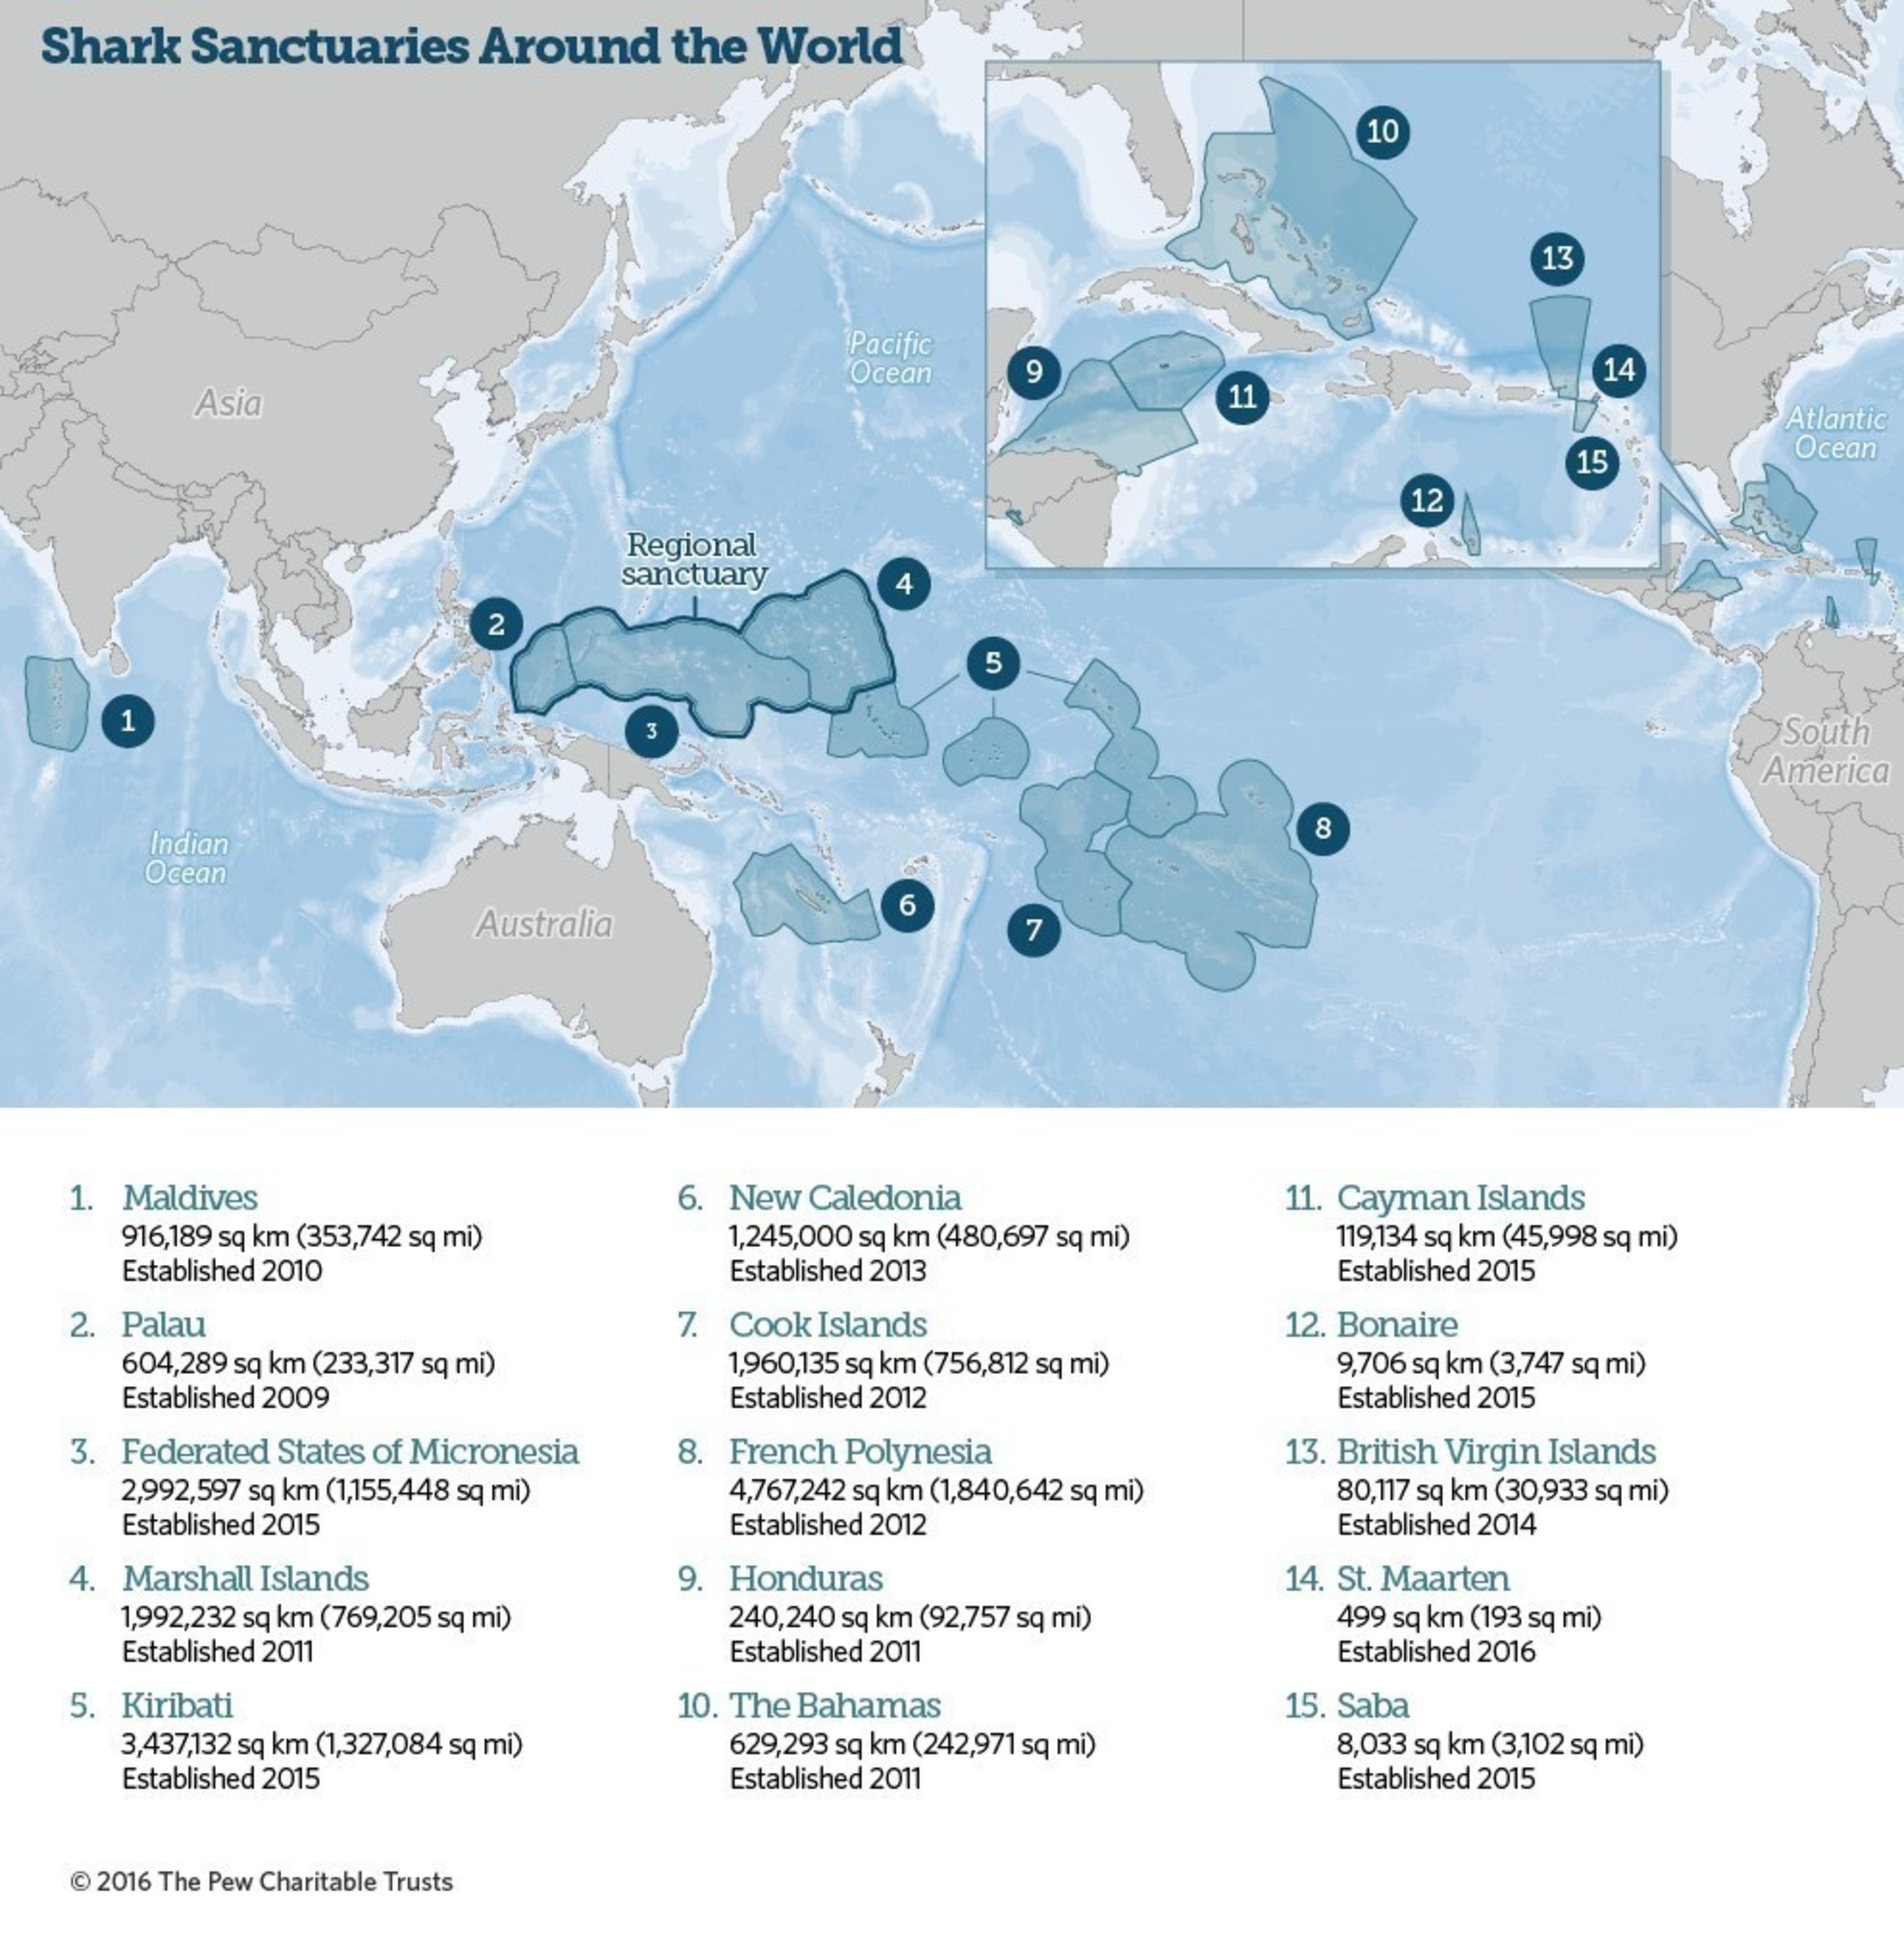 Shark Sanctuaries Around the World